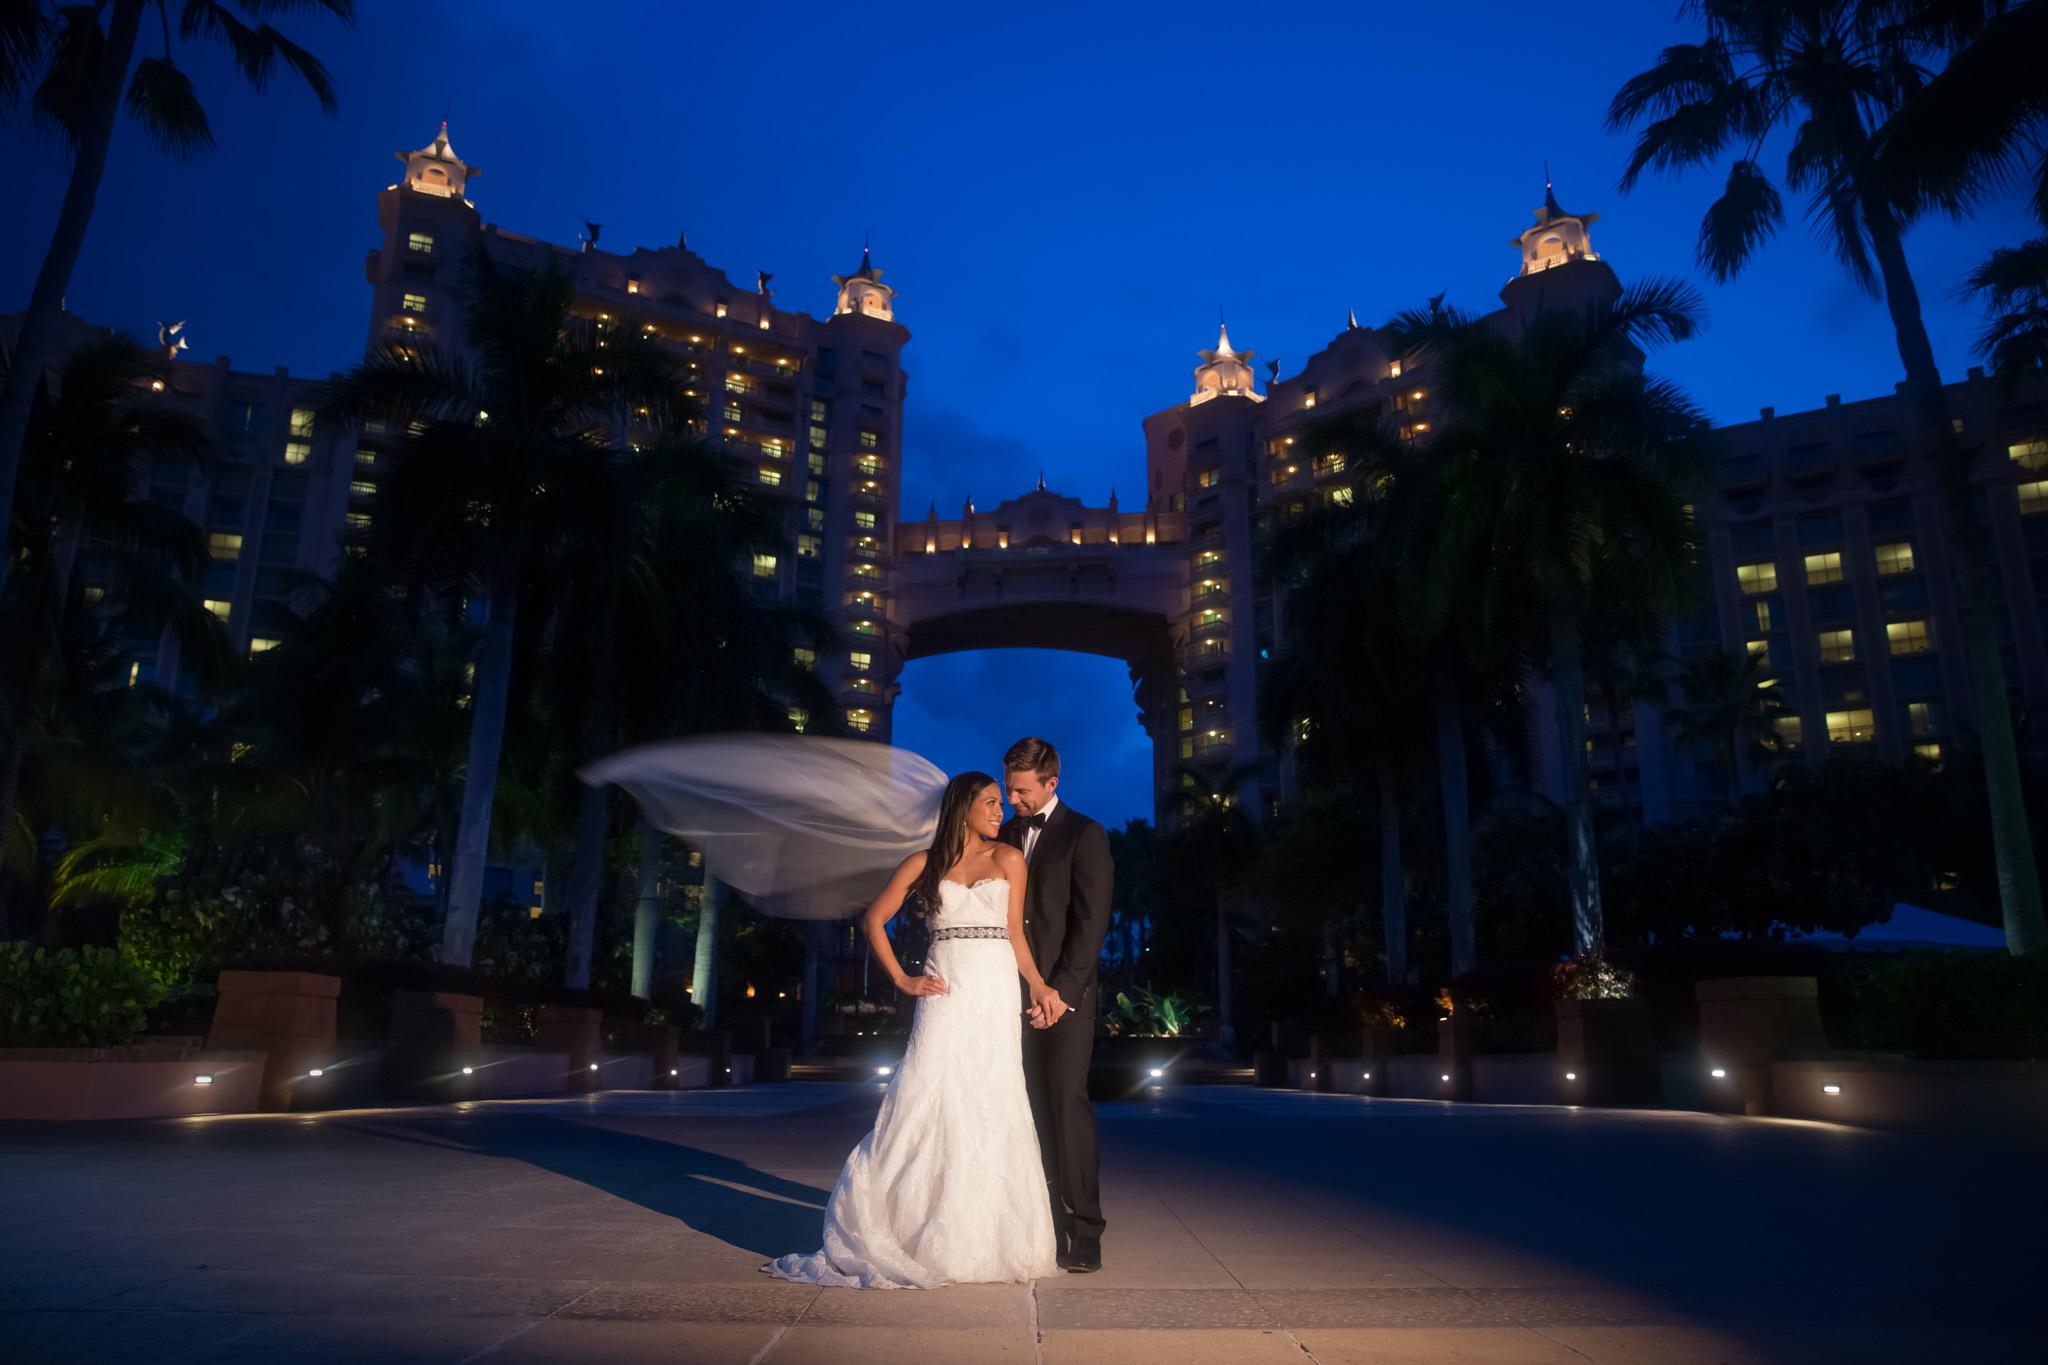 bahamas-bryllupsbilder-farger.jpg